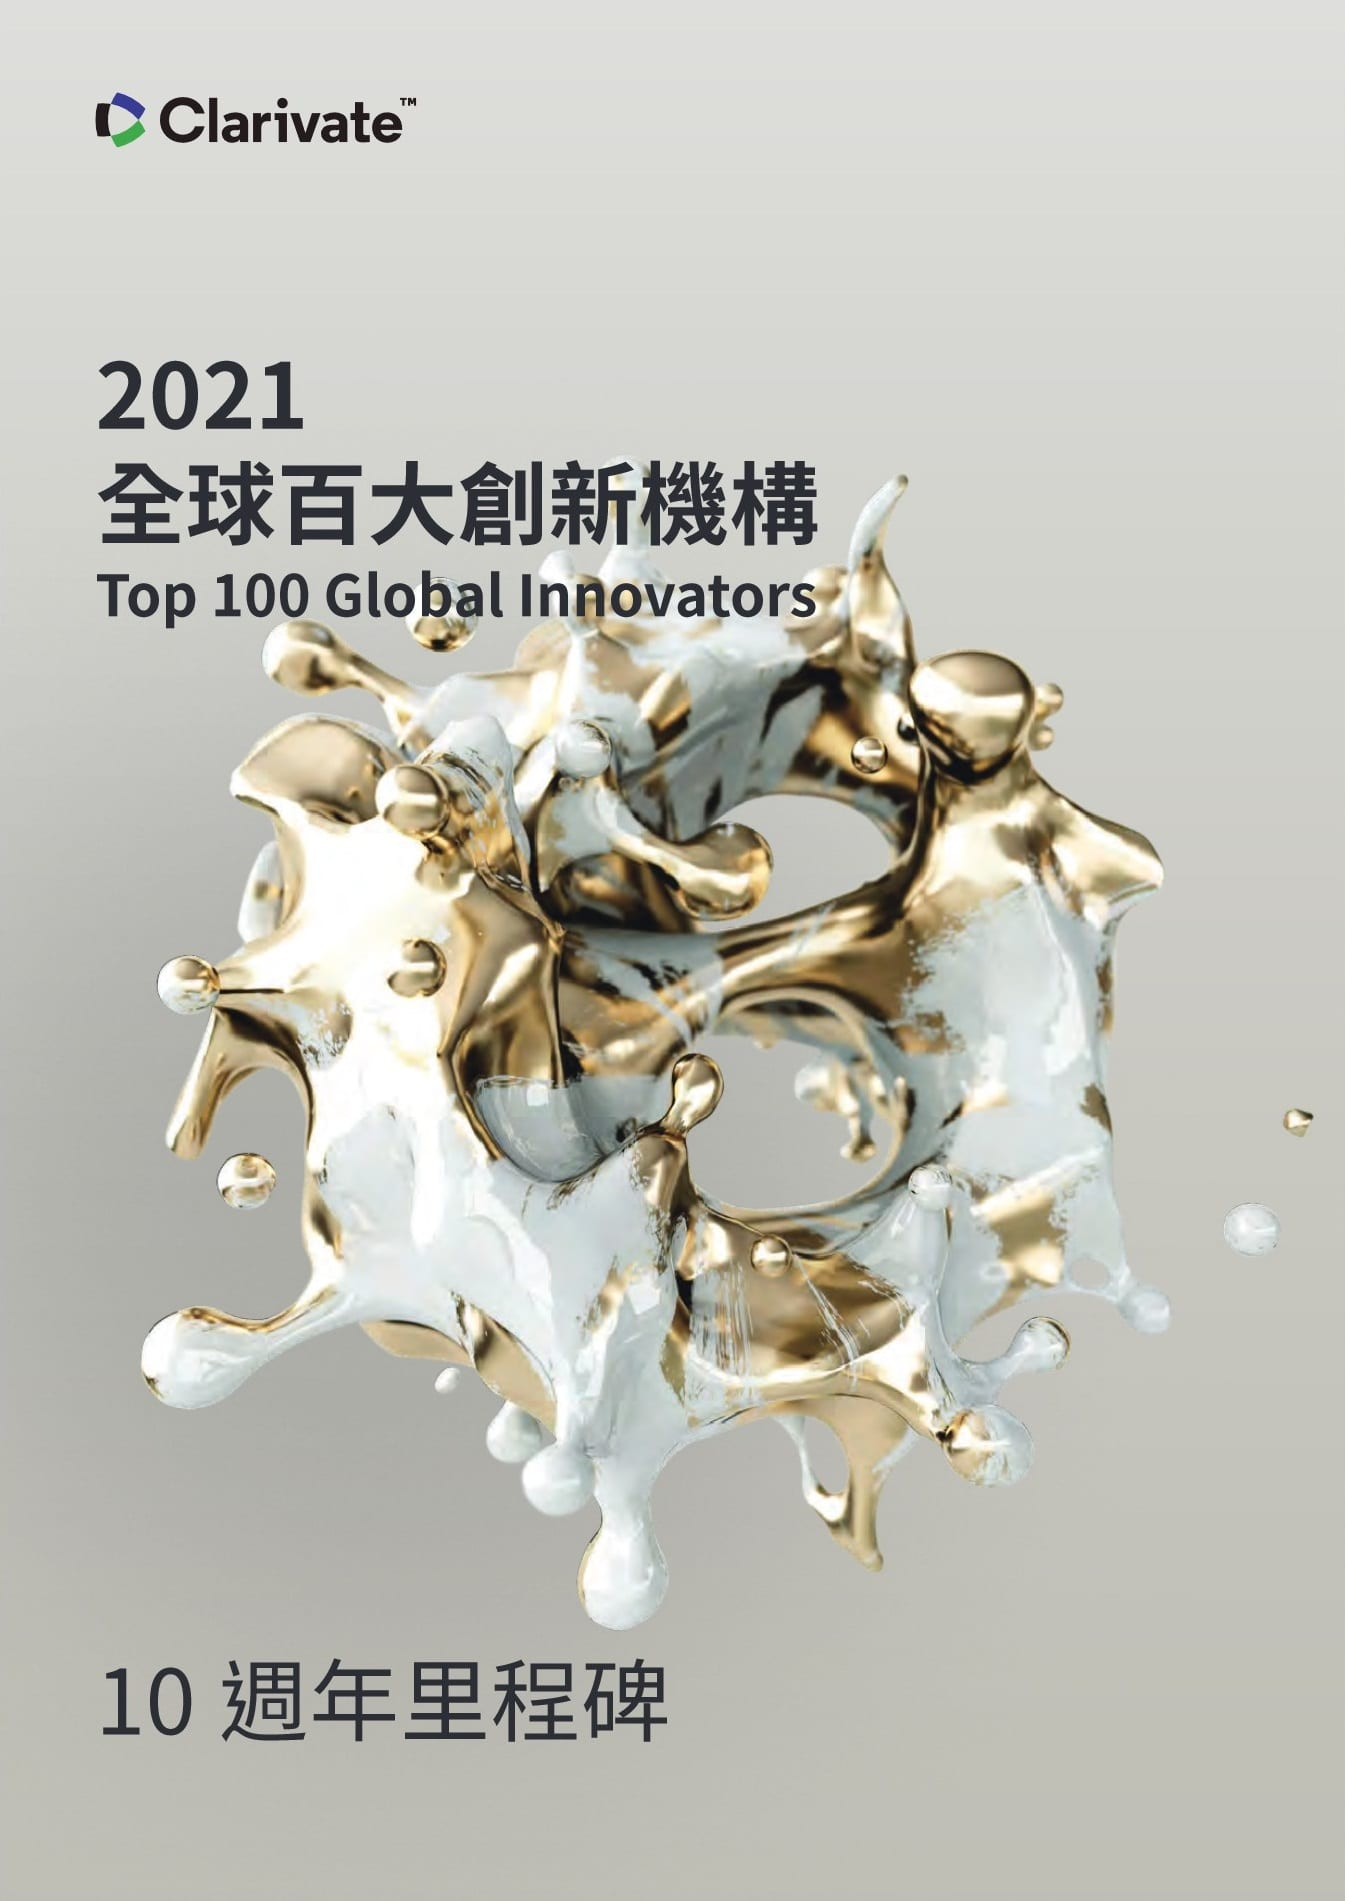 Top 100 Global Innovators